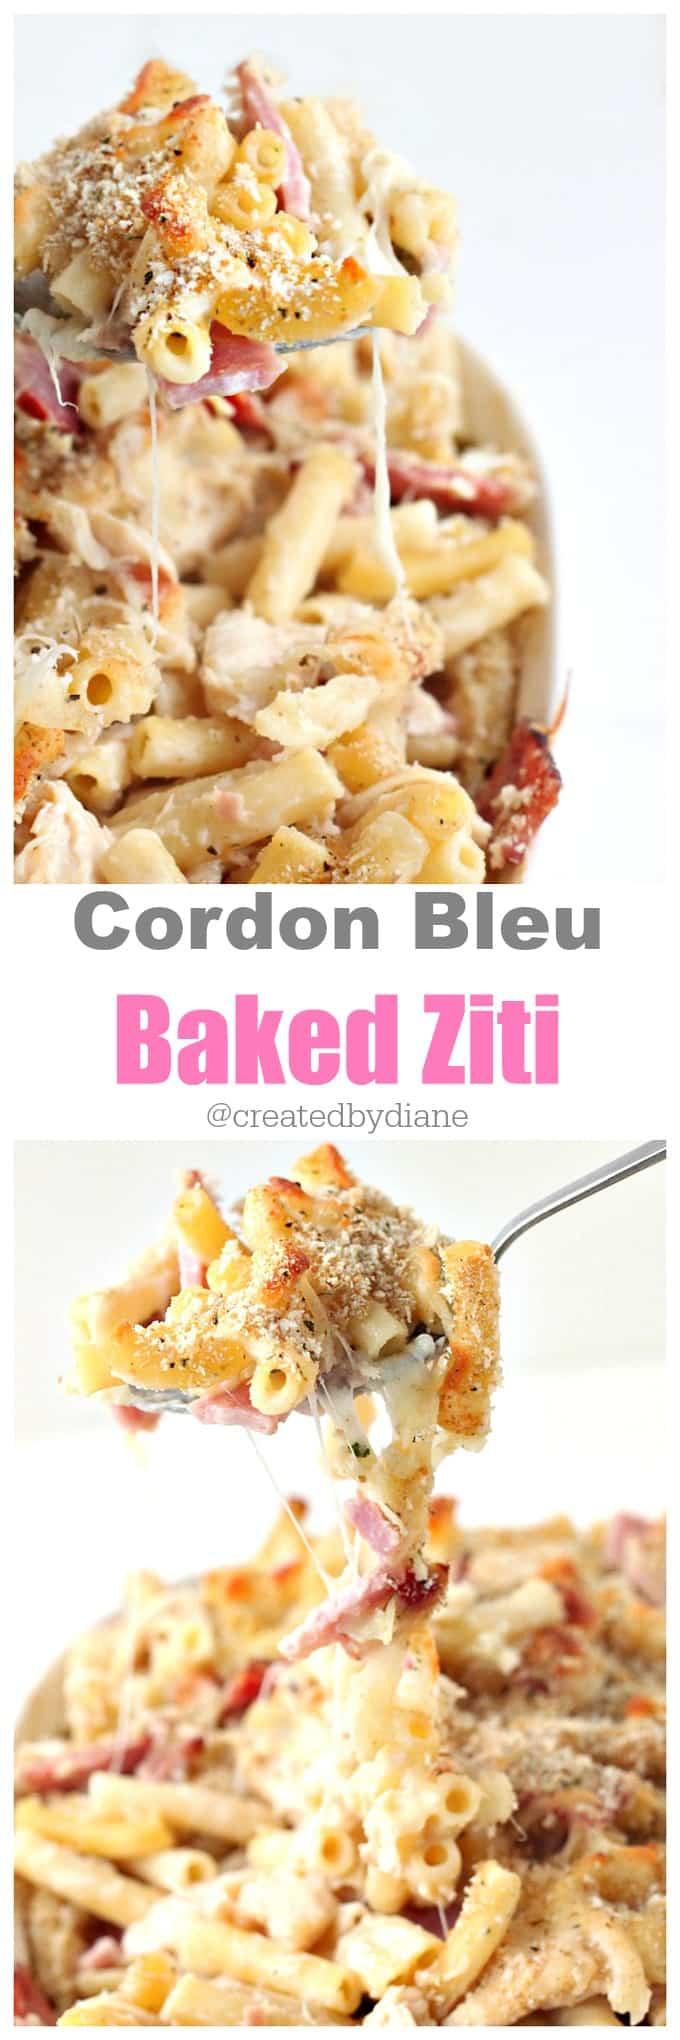 Cordon Bleu Baked Ziti from @createdbydiane